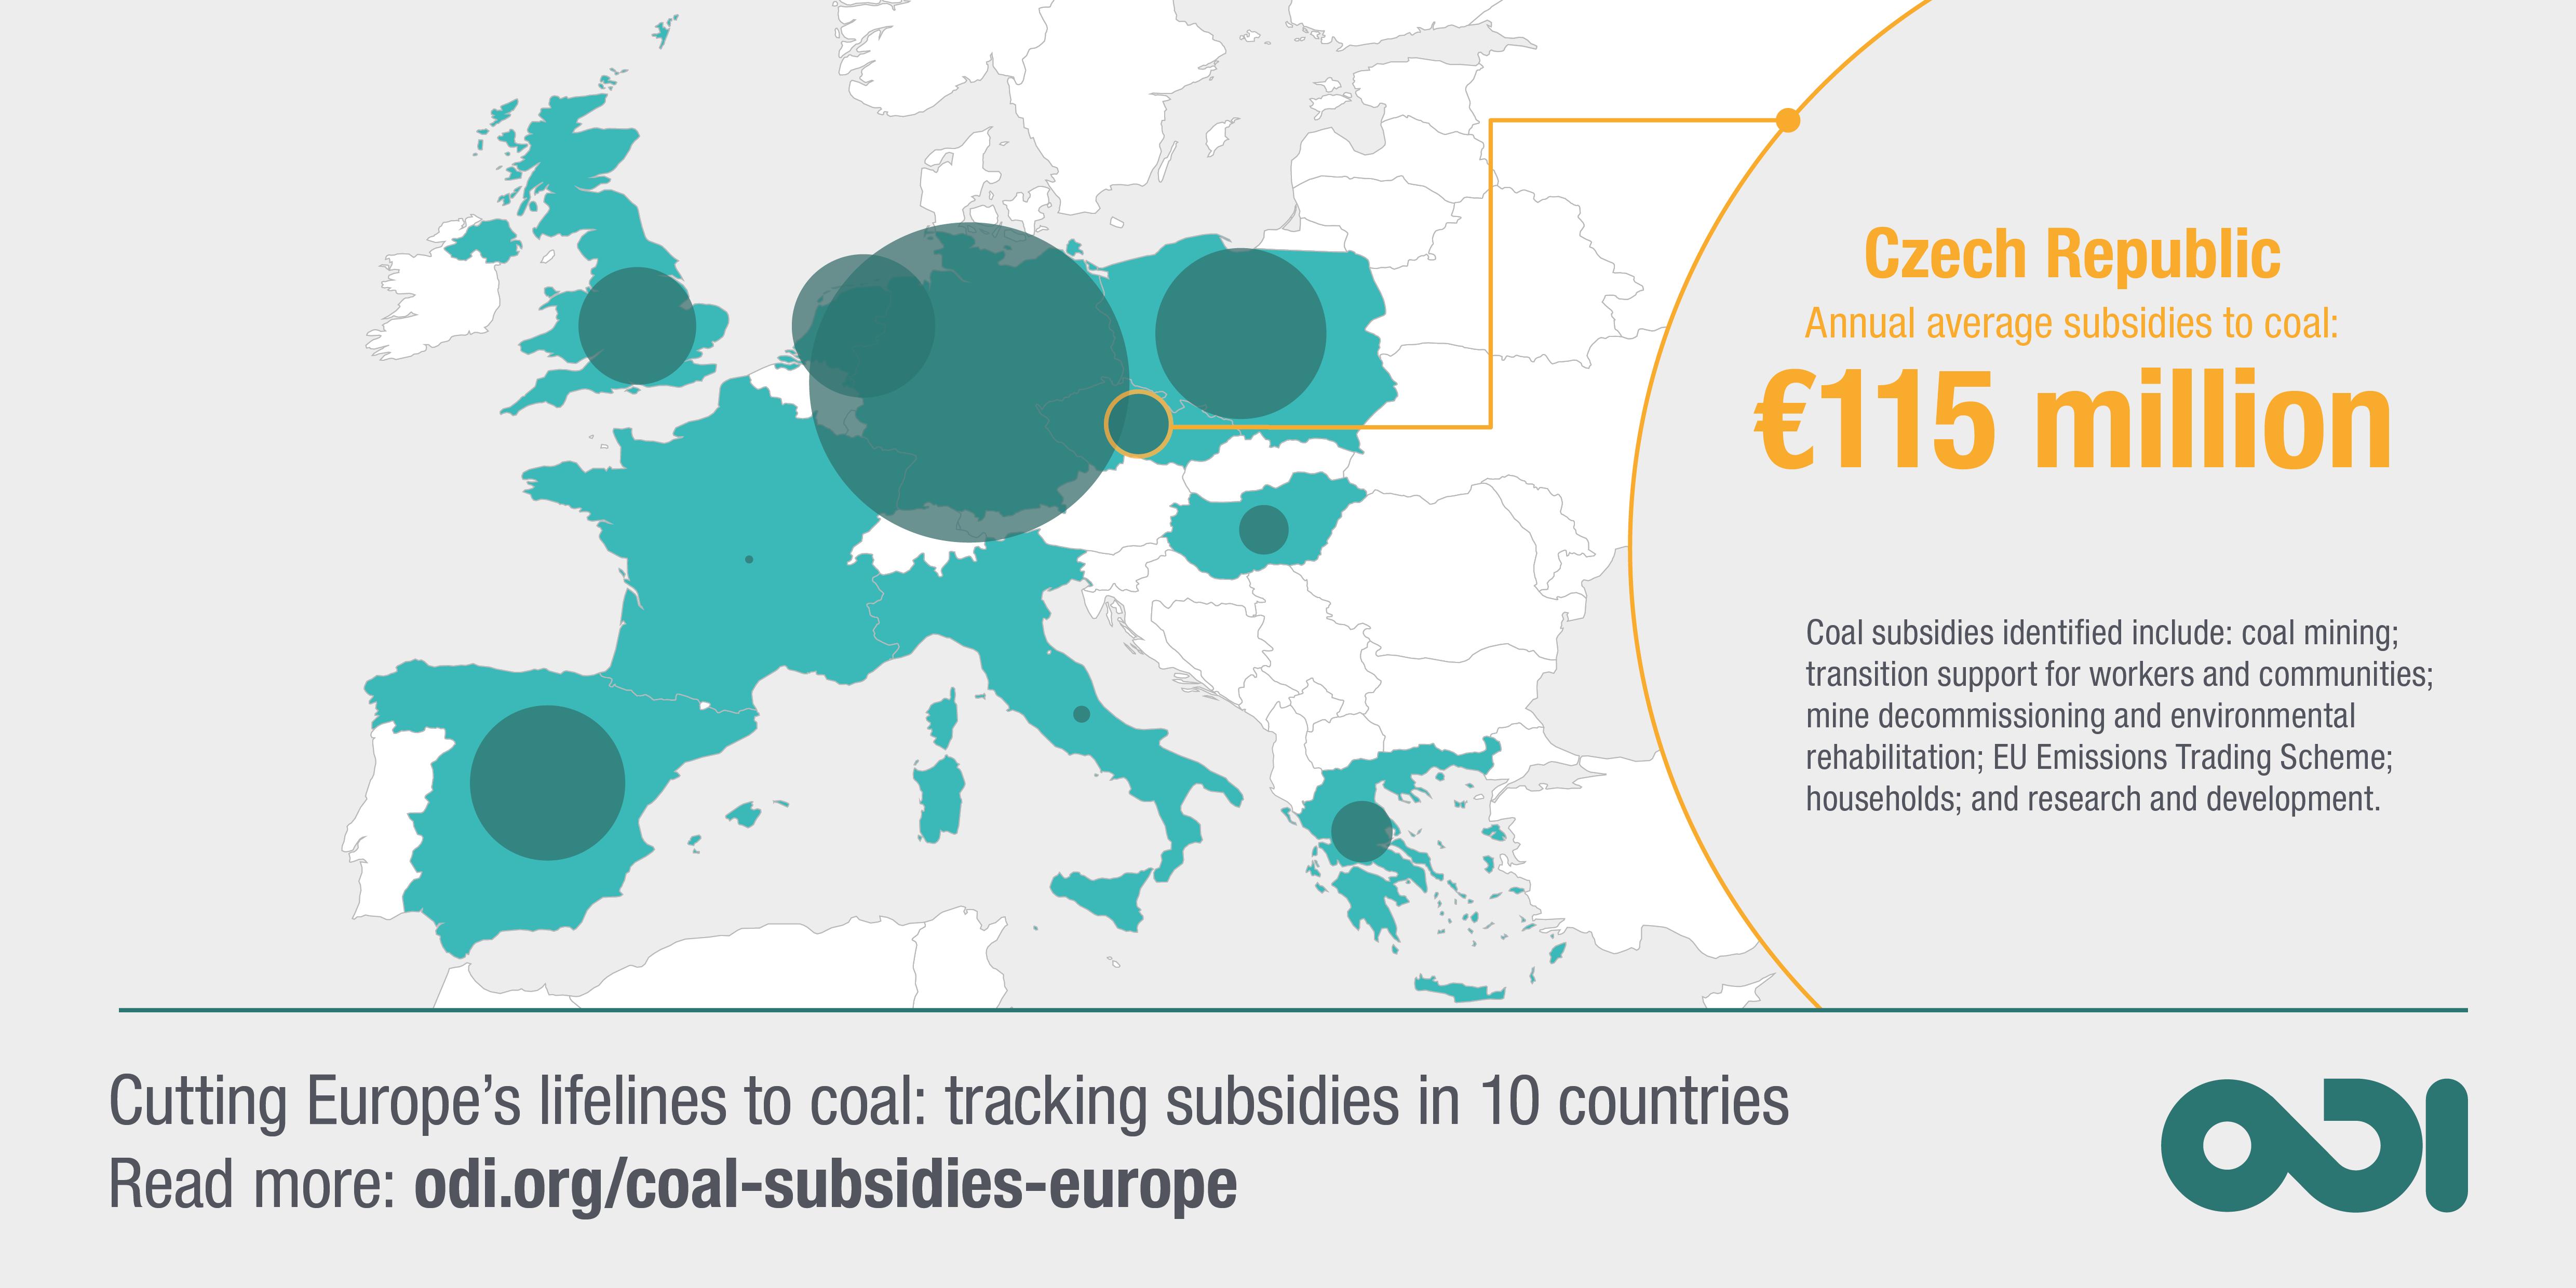 Infographic: Coal subsidies in Czech Republic